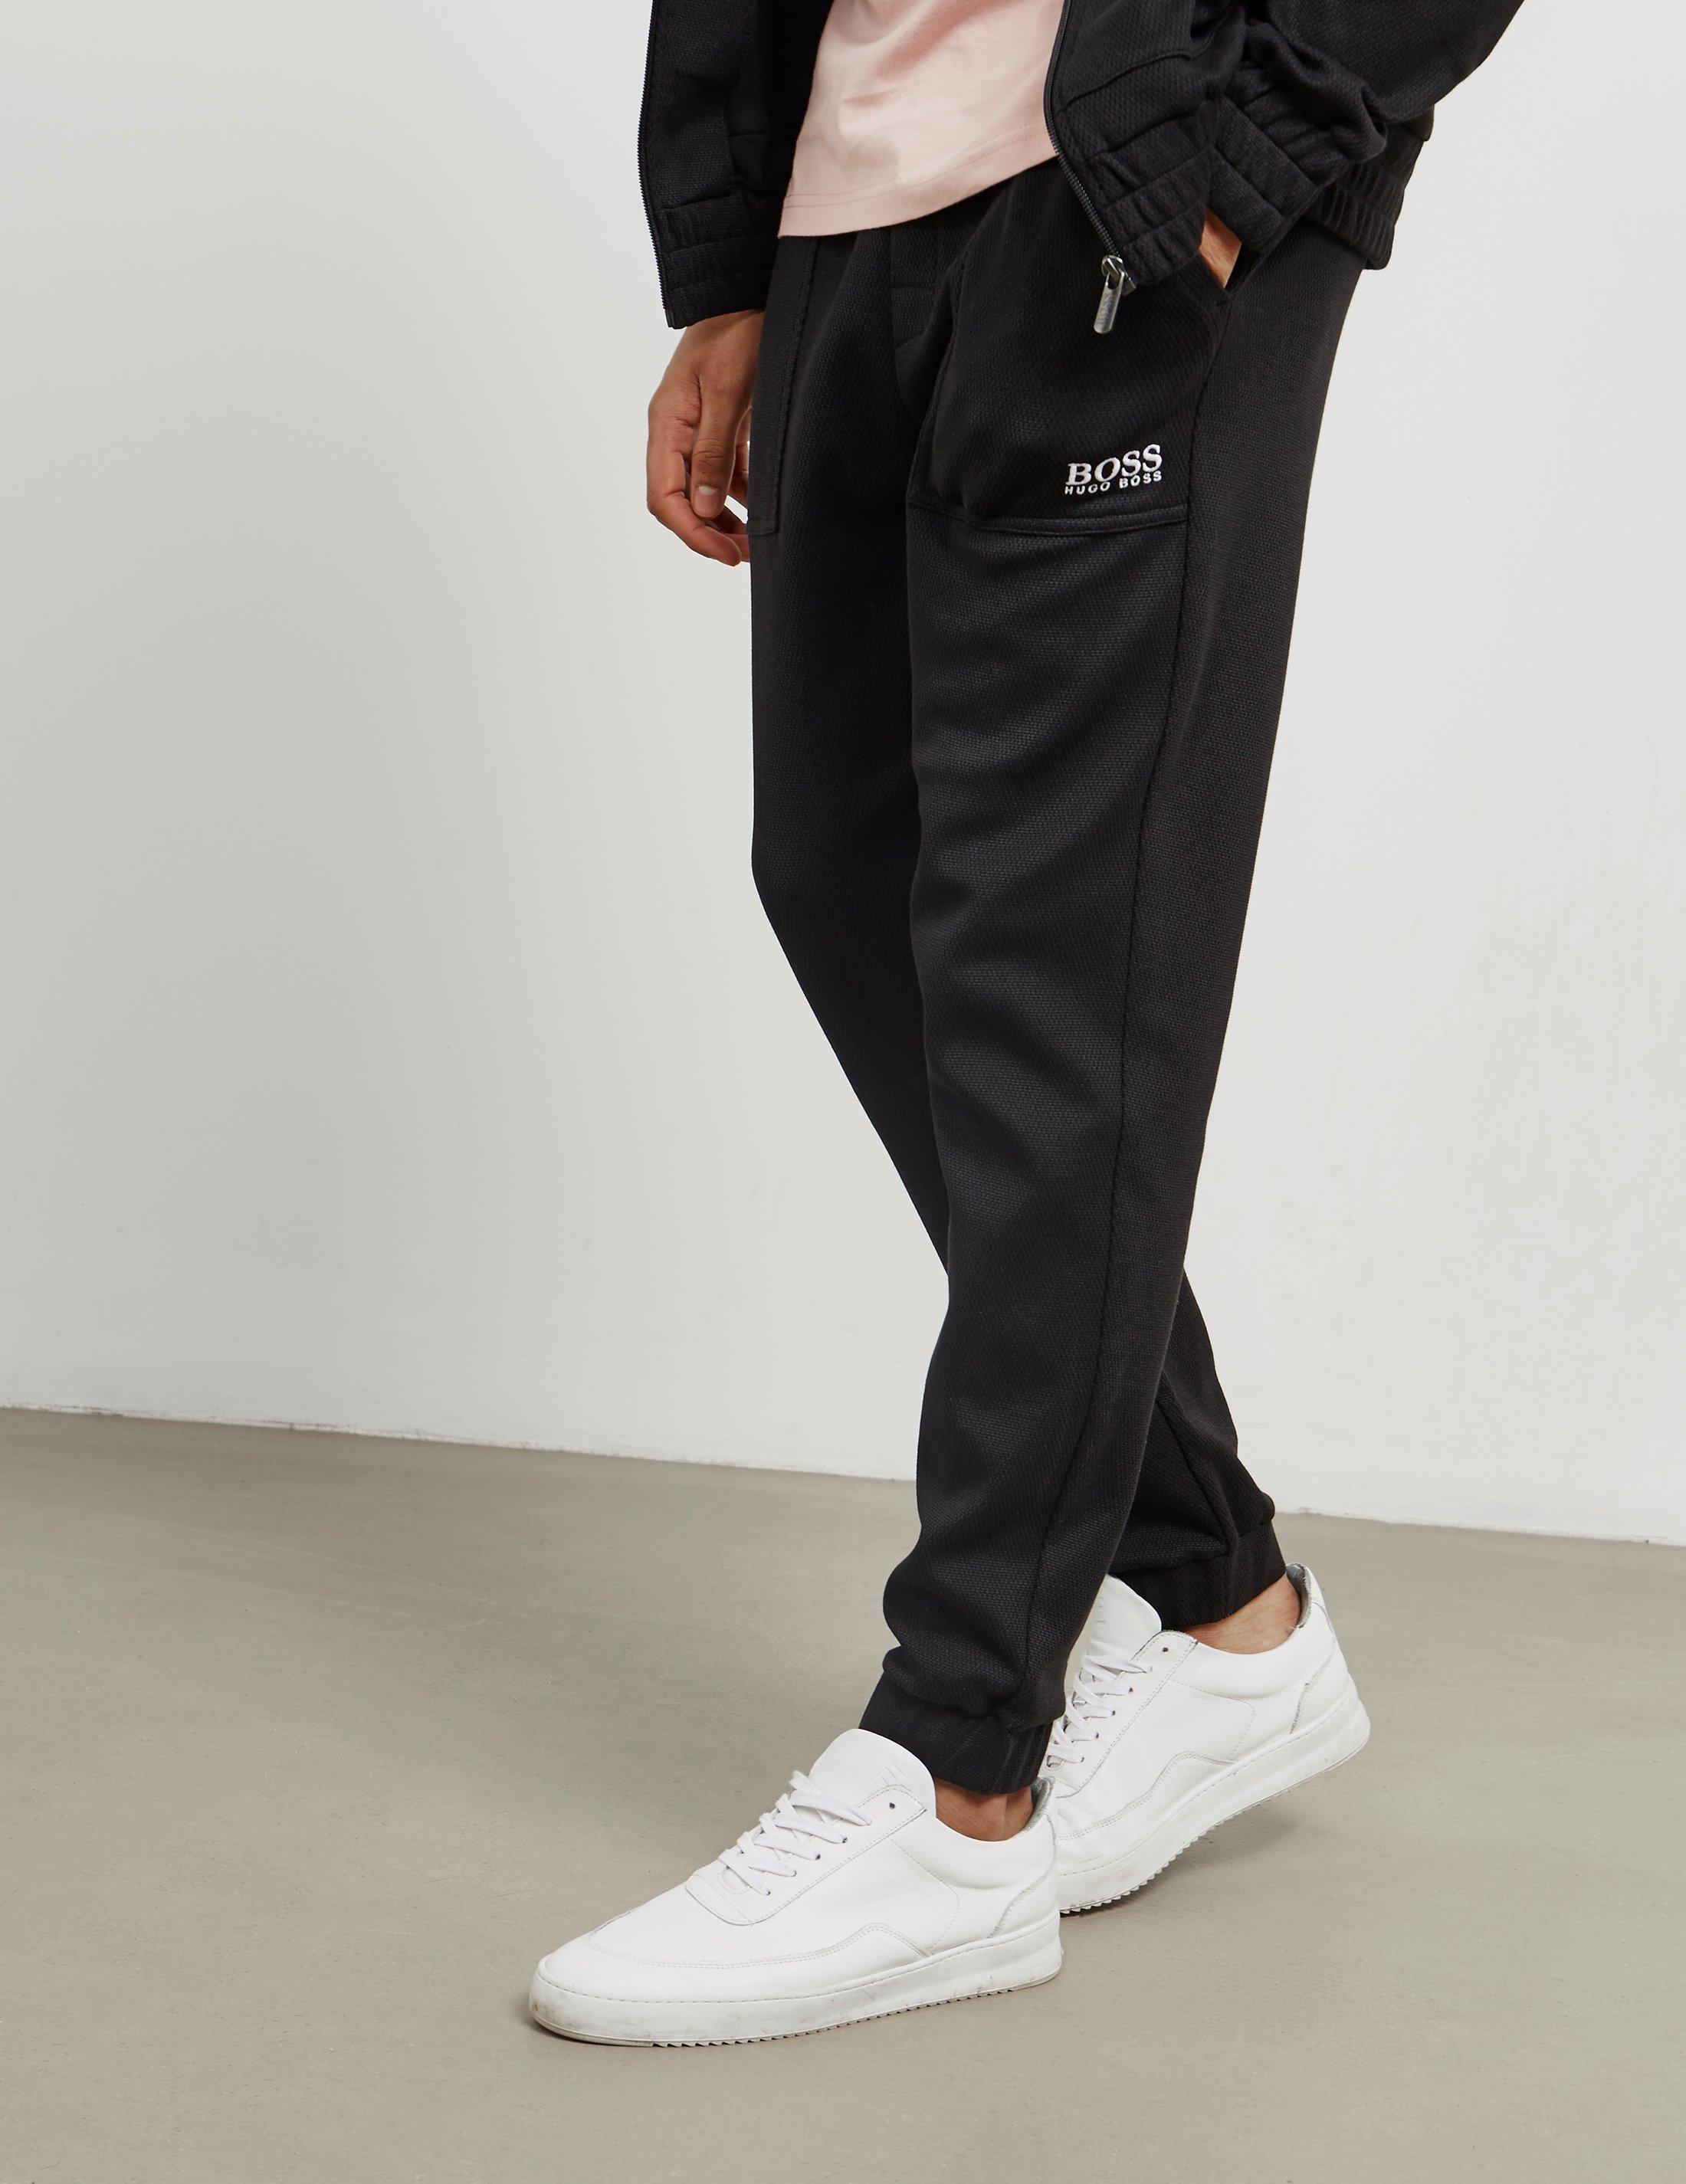 e25b08beabd Lyst - BOSS Mens Contemporary Track Pants Black in Black for Men